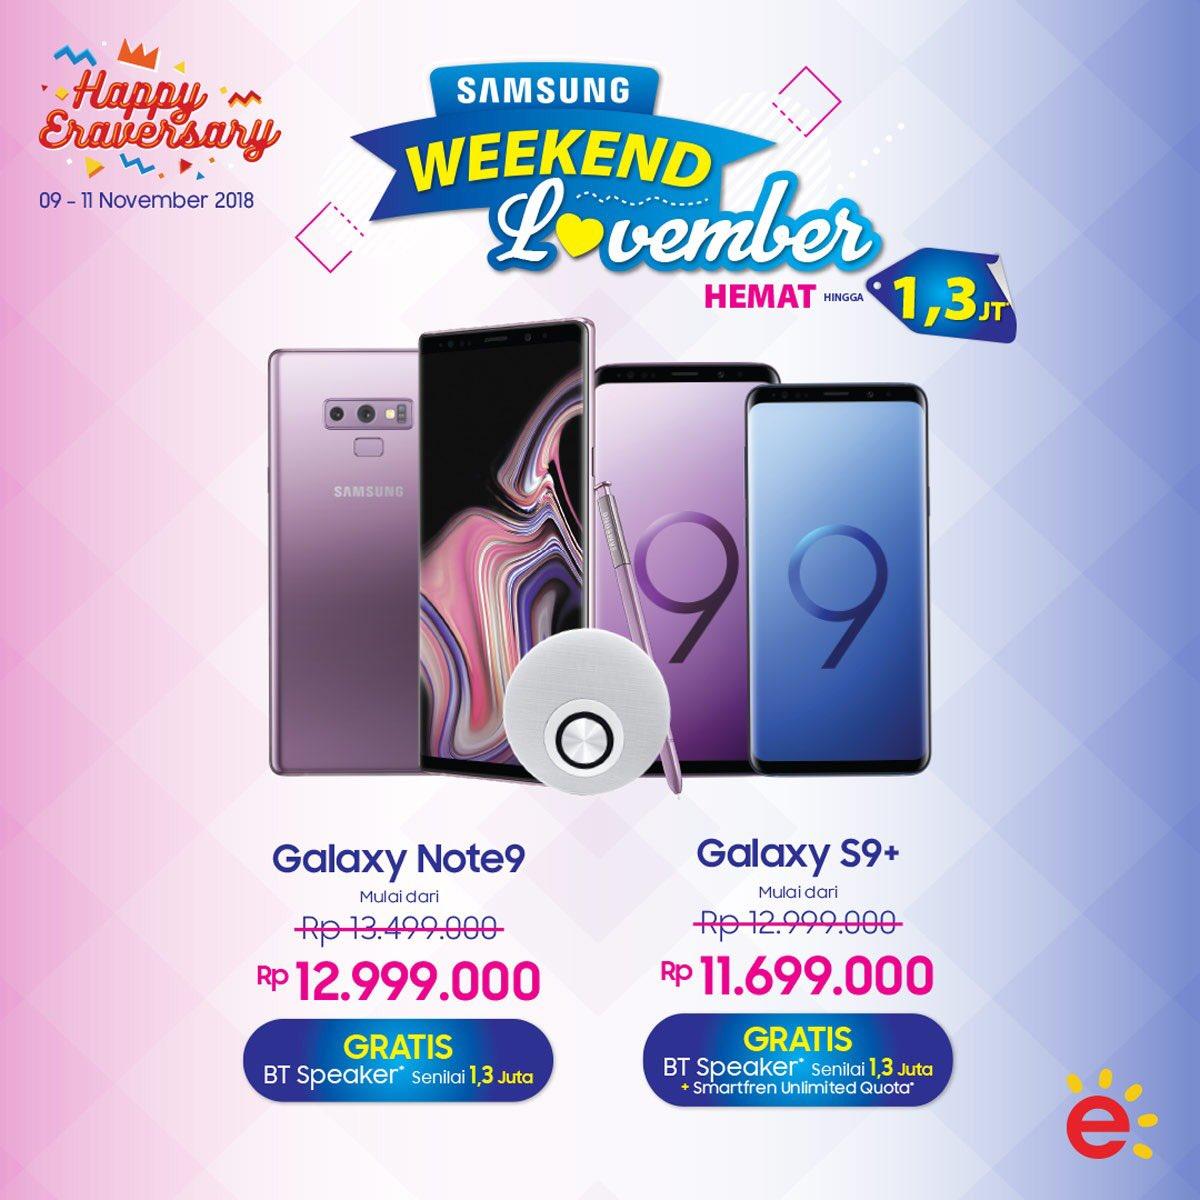 Transmart - Promo Samsung Weekend Lovember Hemat & Gratis (s.d 11 Nov 2018)